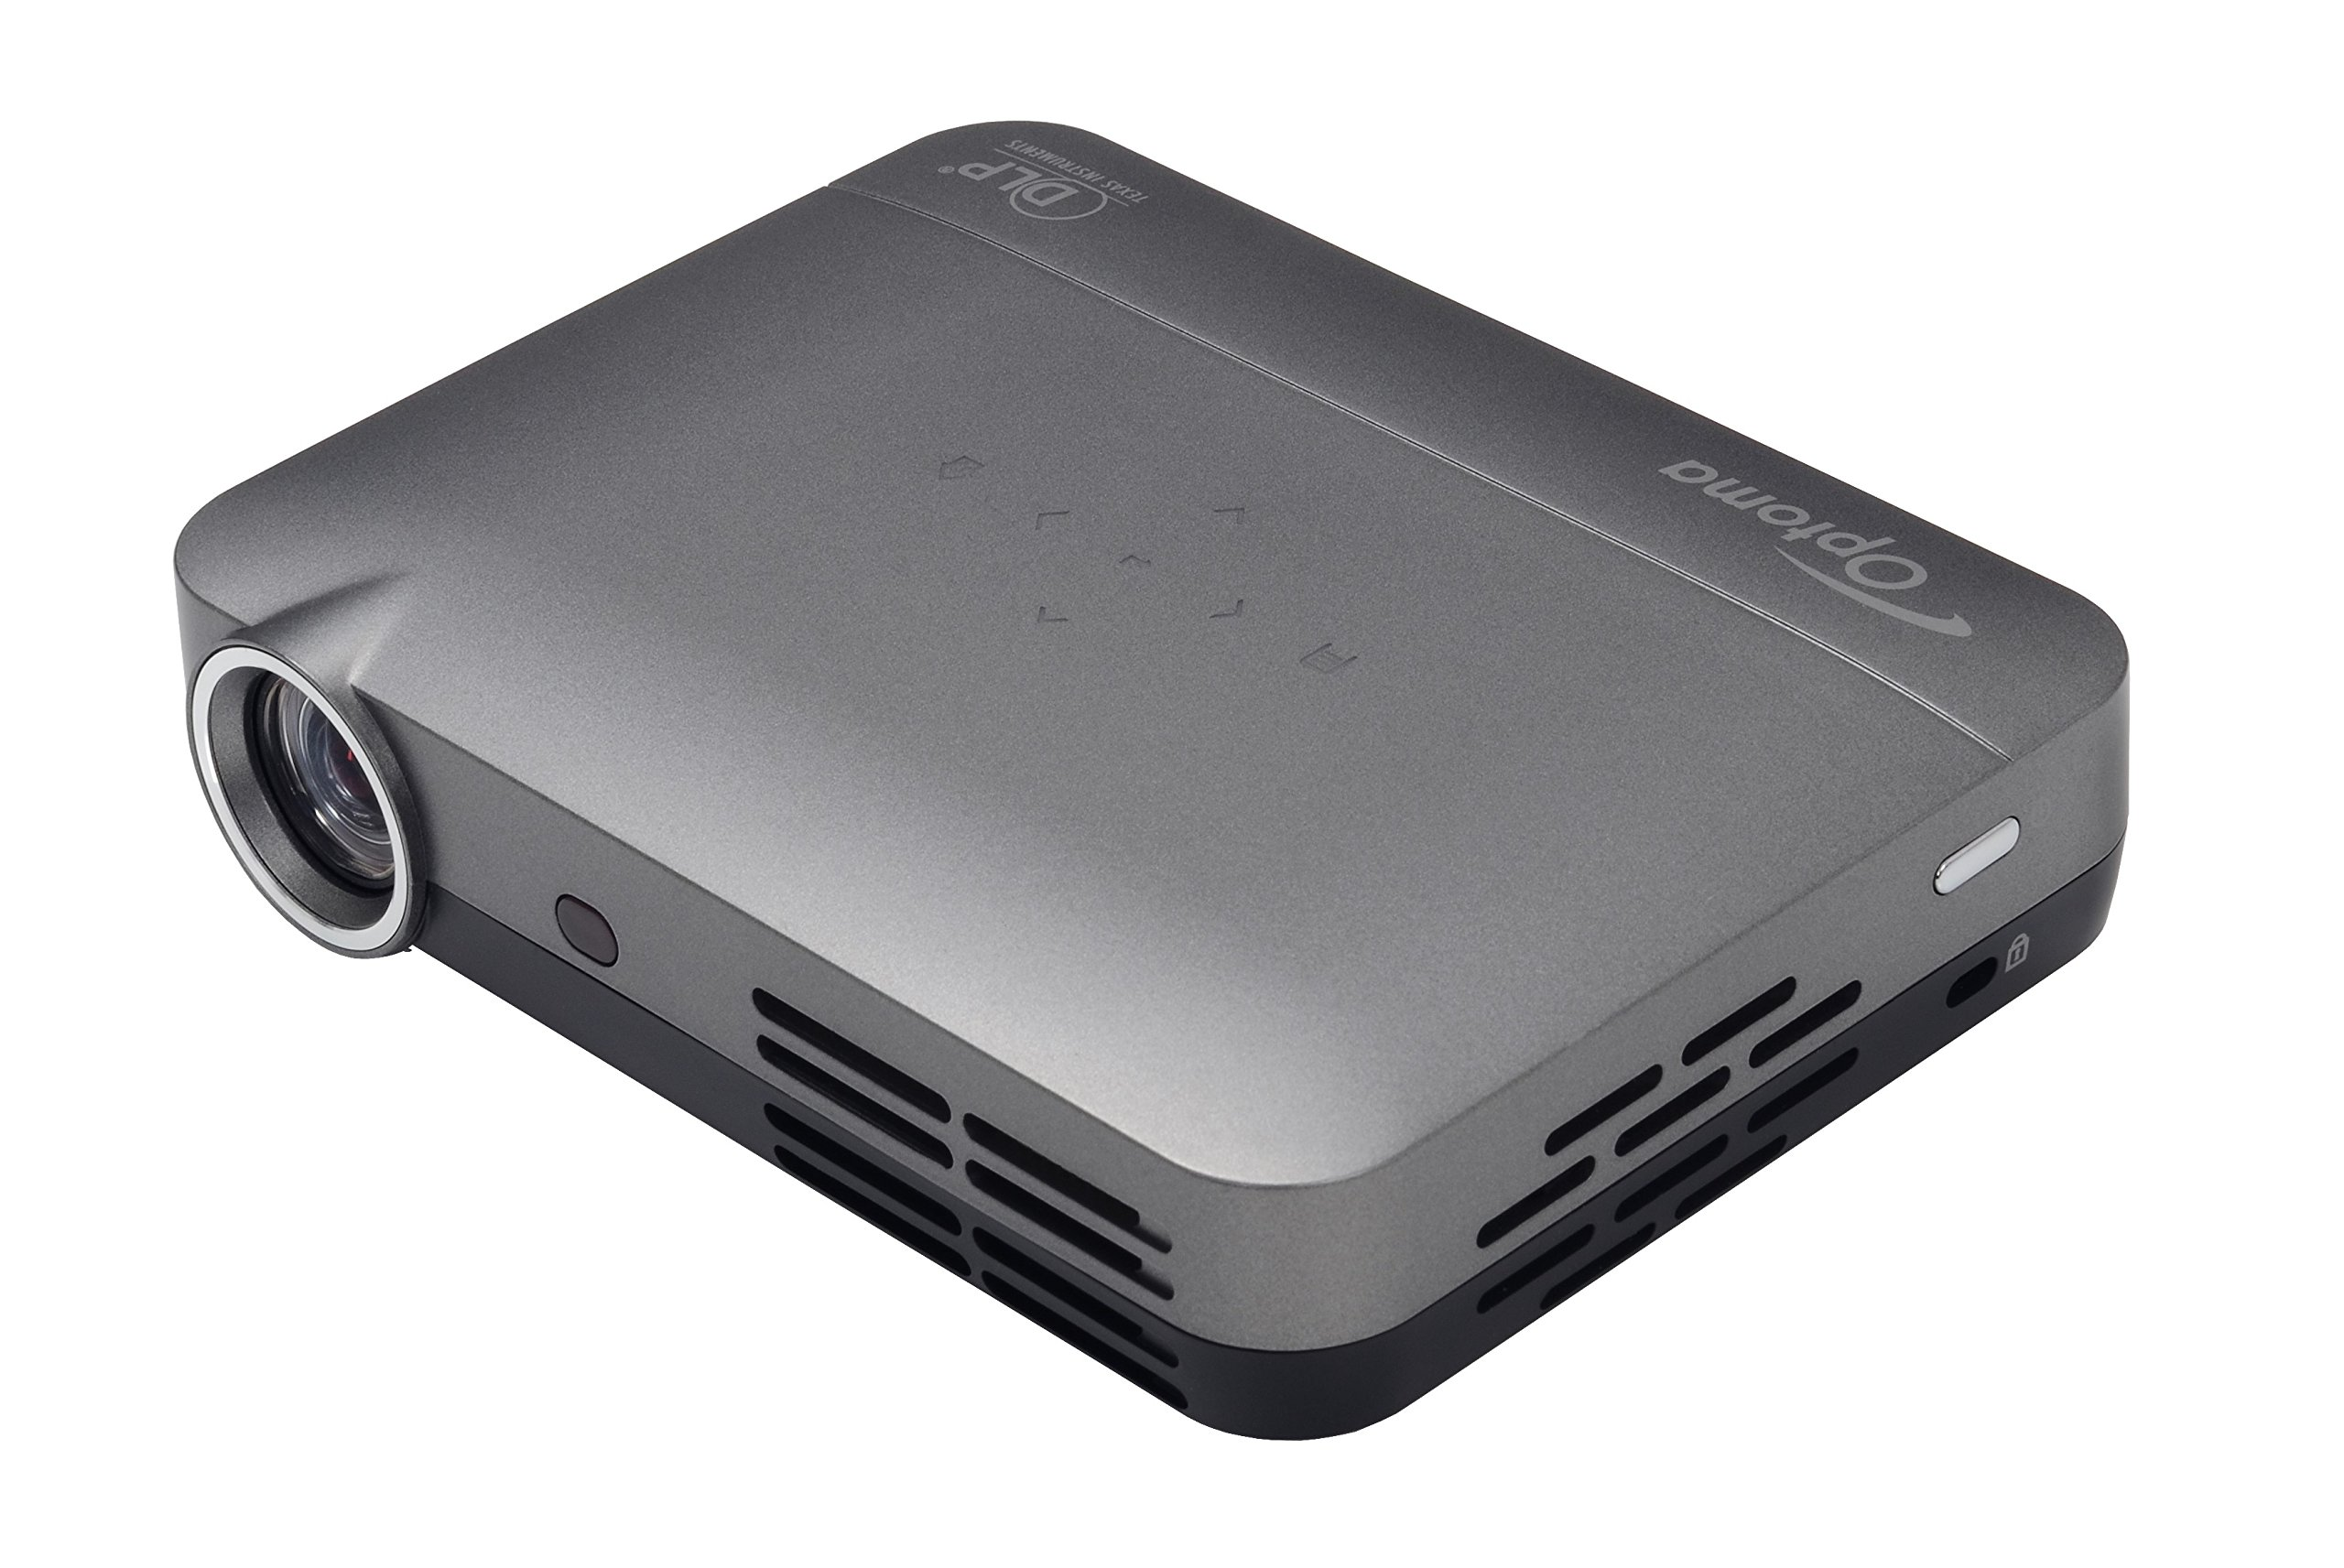 81yV7BkQ3sL - Optoma ML330 500 LED Brightness Ultra-Compact Android LED Projector - Grey/Black